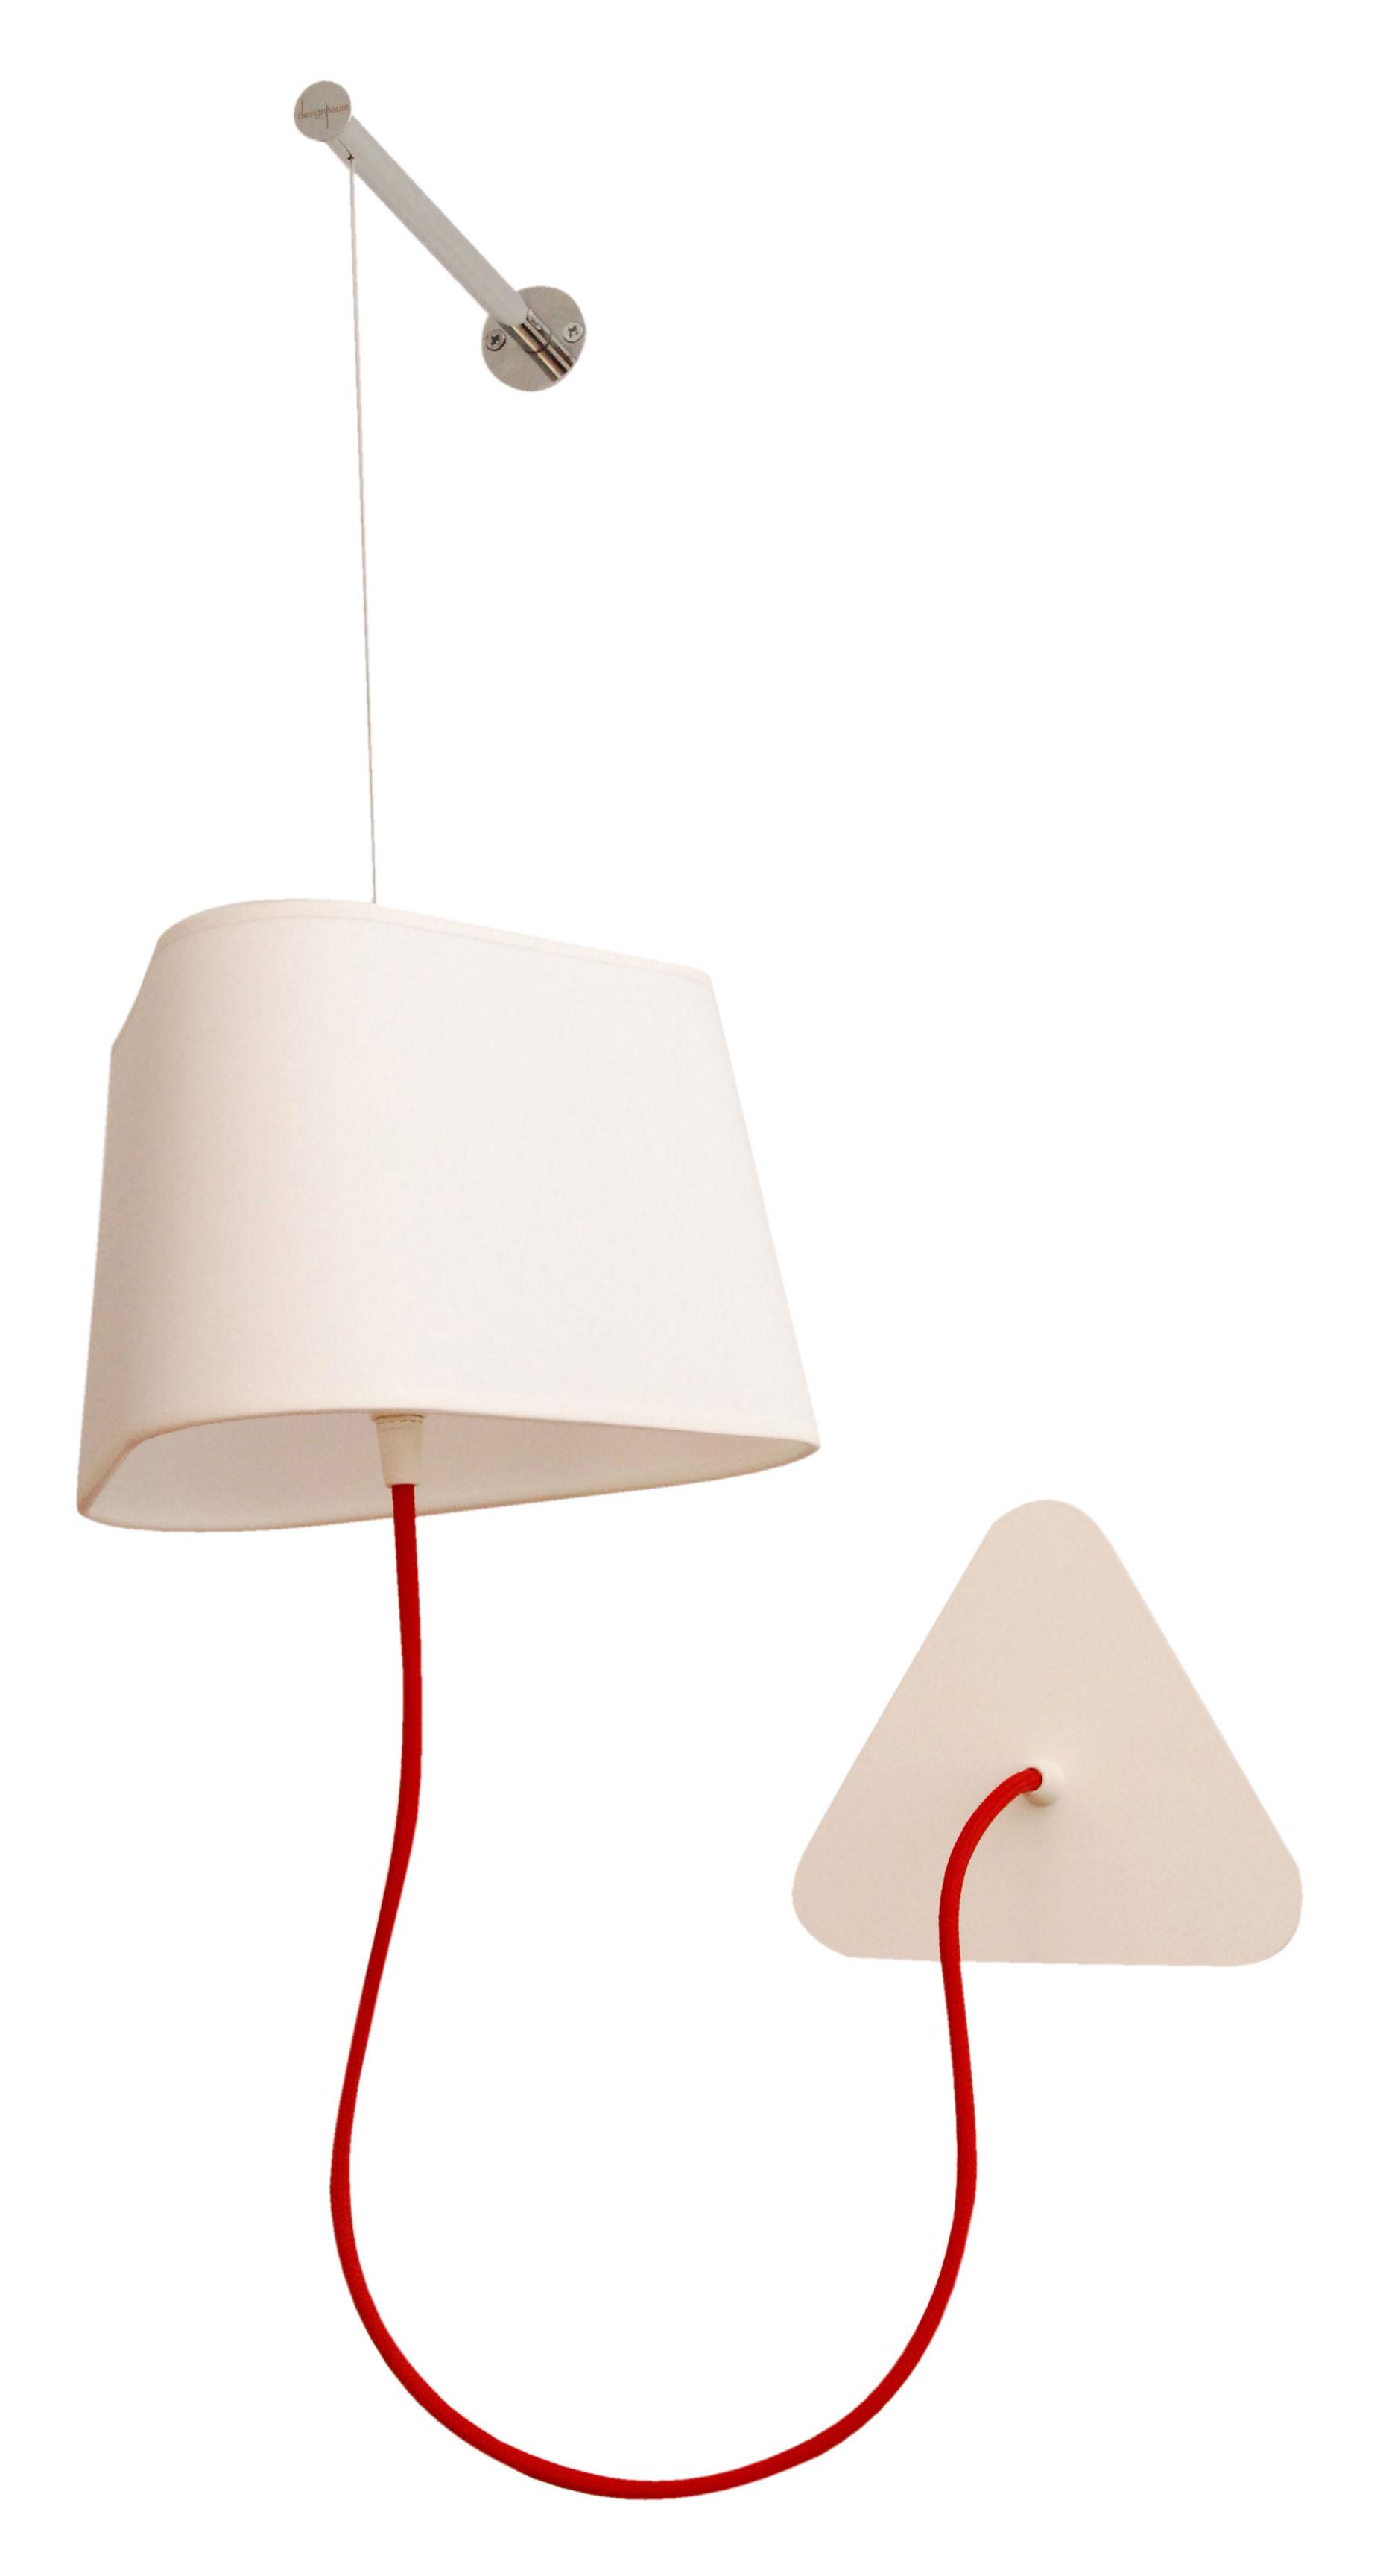 applique petit nuage l 24 cm fixation murale tissu blanc uni designheure. Black Bedroom Furniture Sets. Home Design Ideas